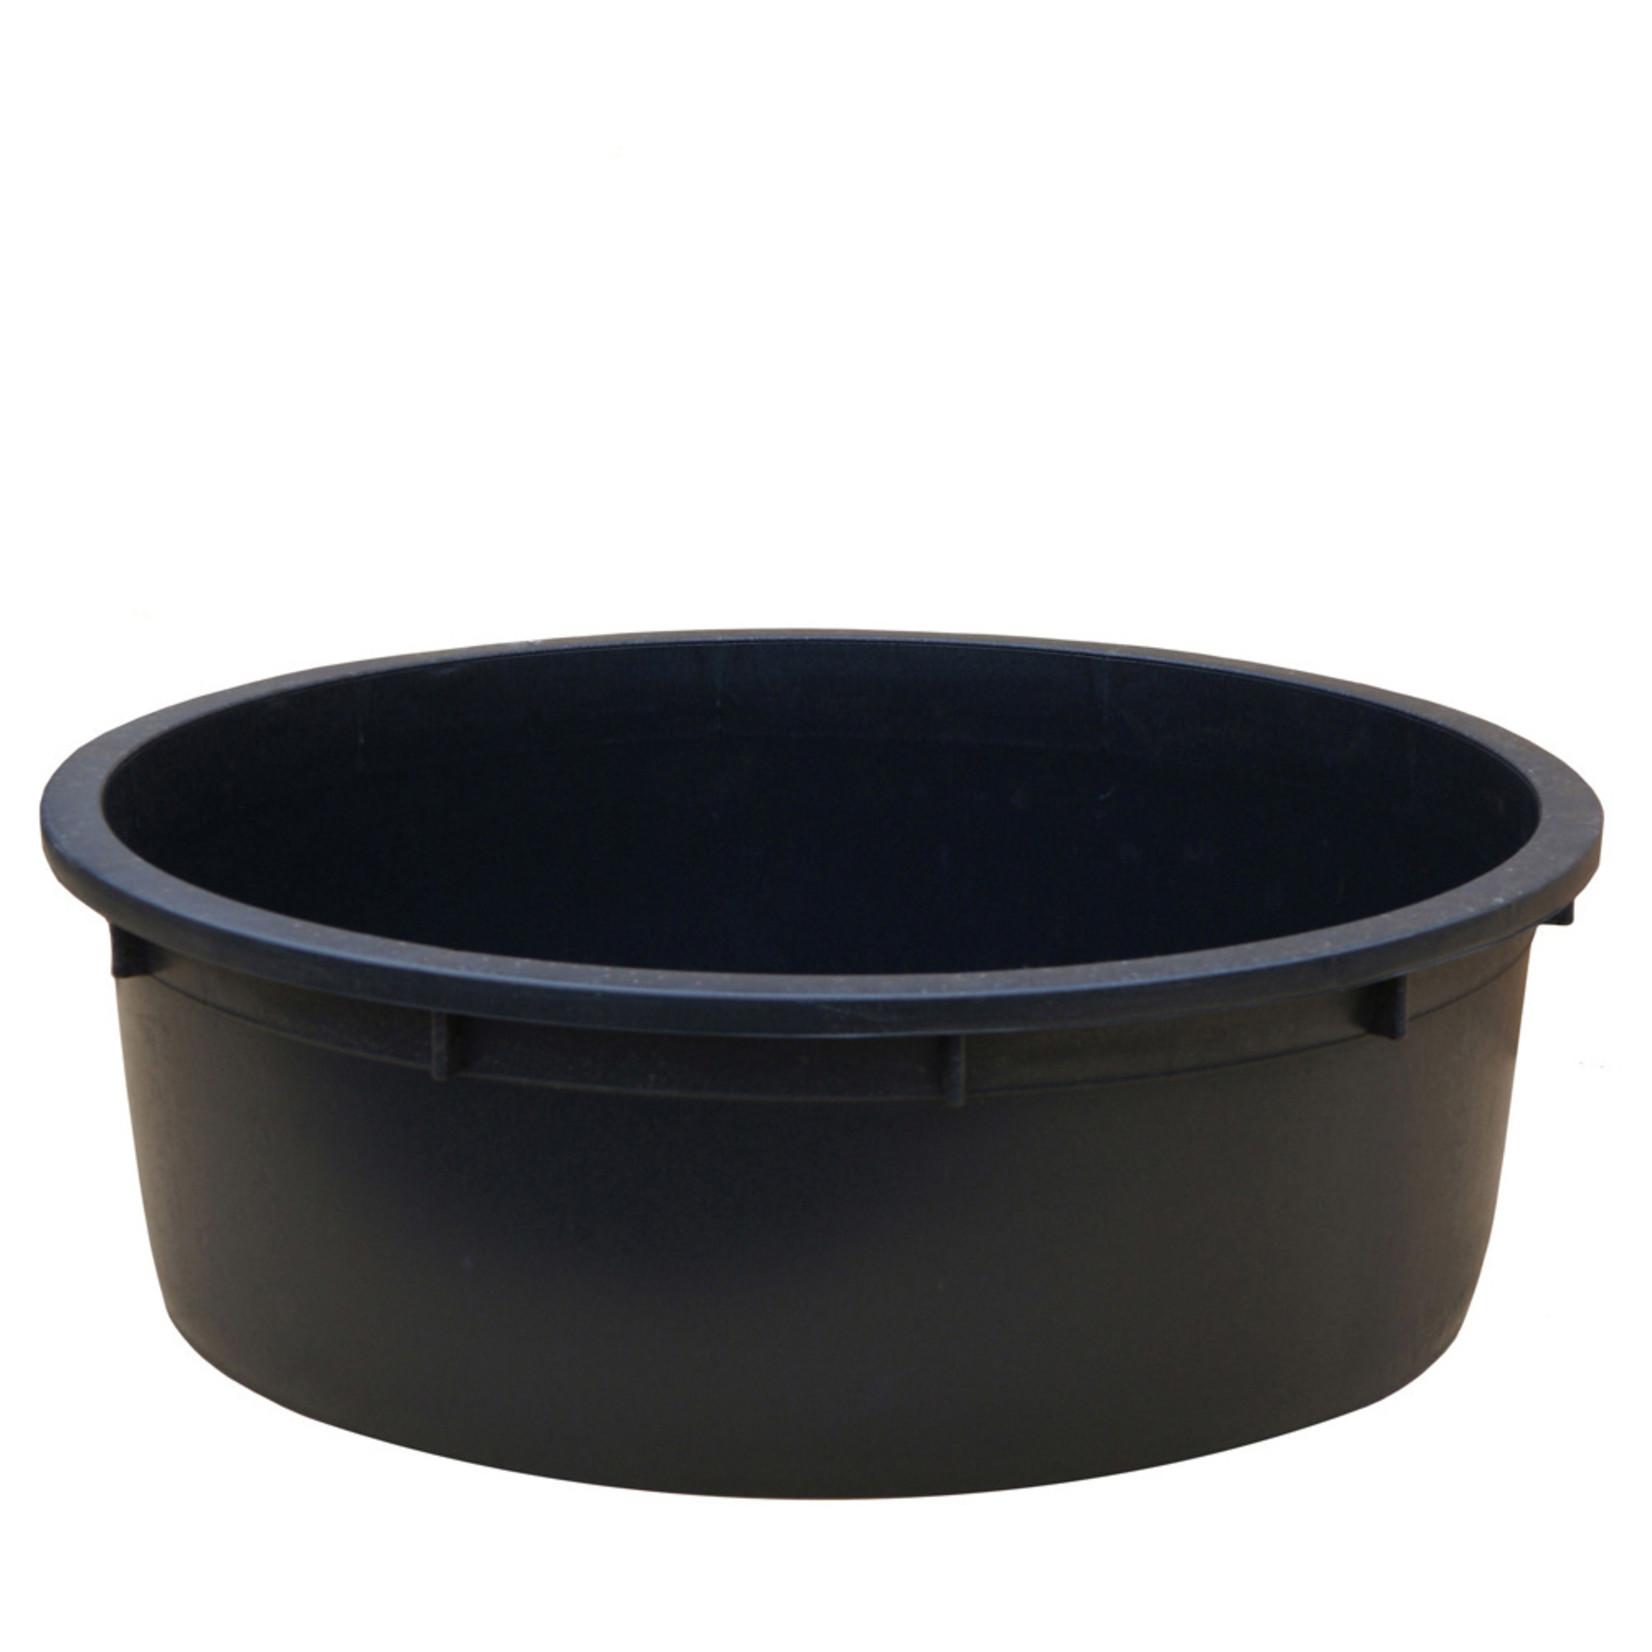 Boomkuip 100 liter Ø 75 x h.33 cm